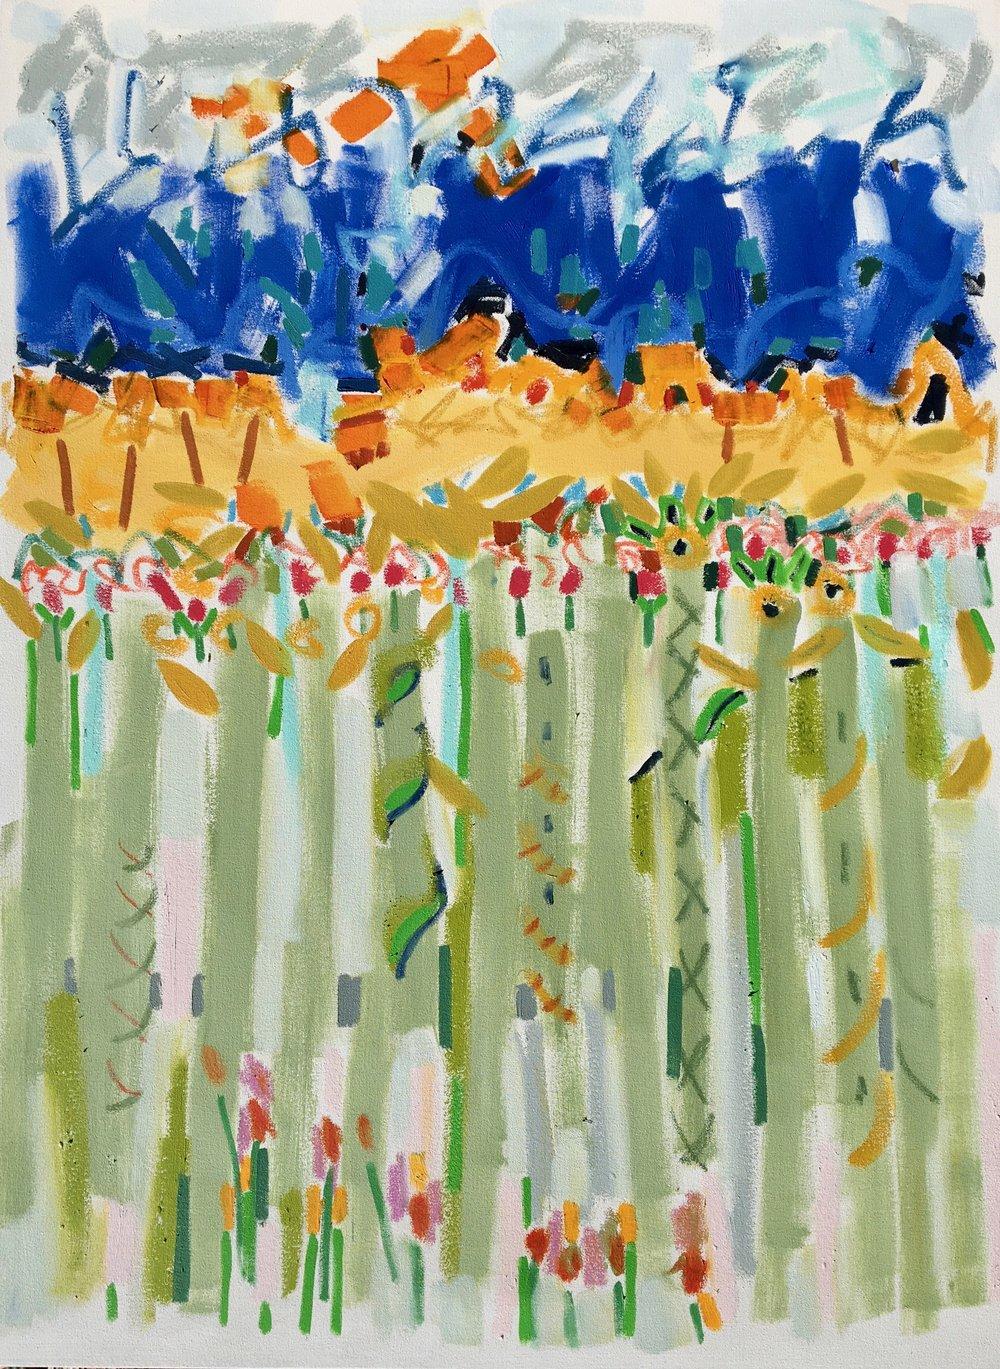 Jimmy Plants the Garden I, 48x36